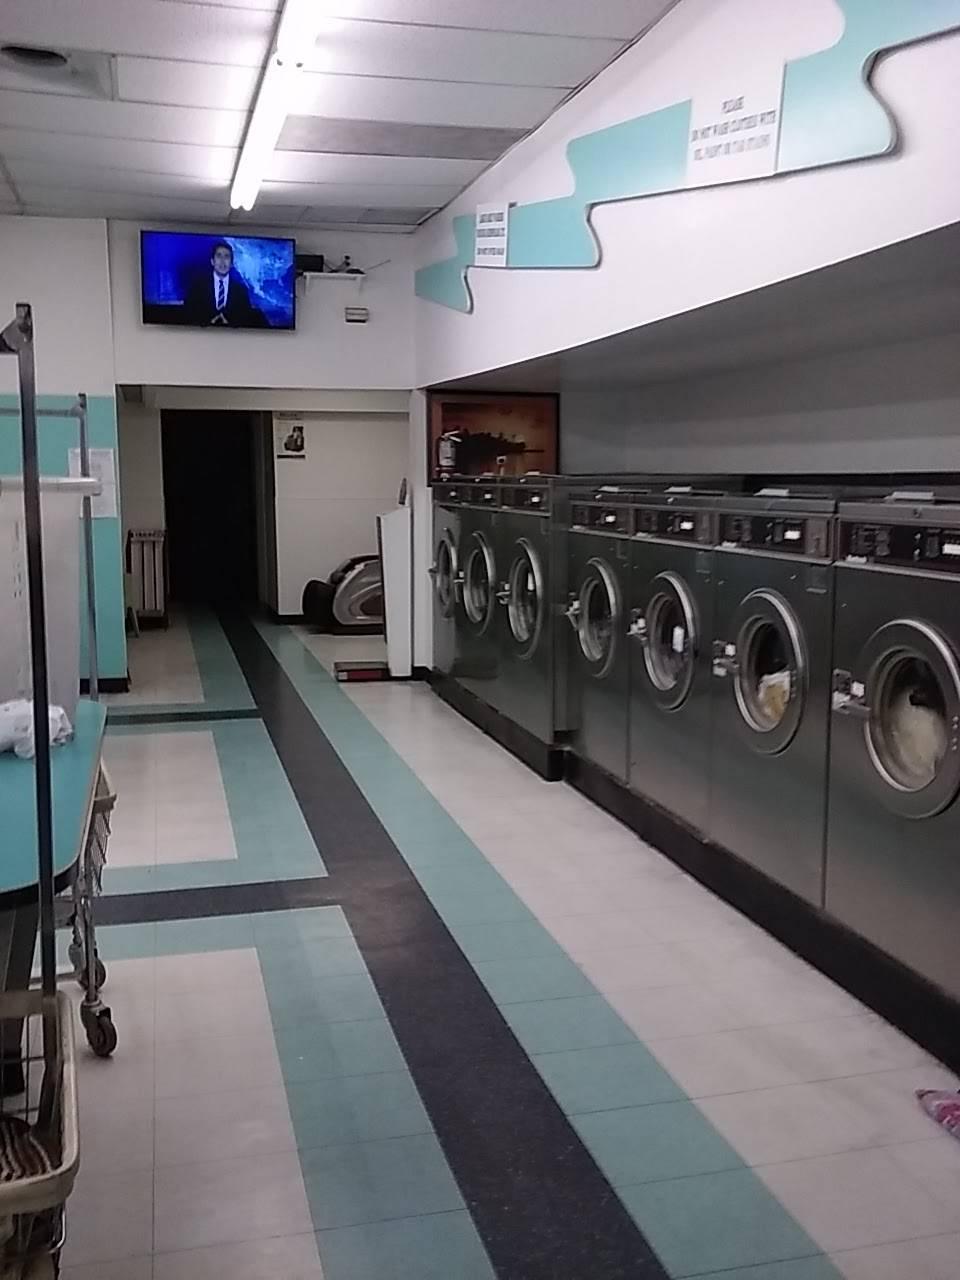 Kims Coin Laundry & Dry Cleaners - laundry  | Photo 3 of 10 | Address: 4450 E Charleston Blvd # 4, Las Vegas, NV 89104, USA | Phone: (702) 489-4417